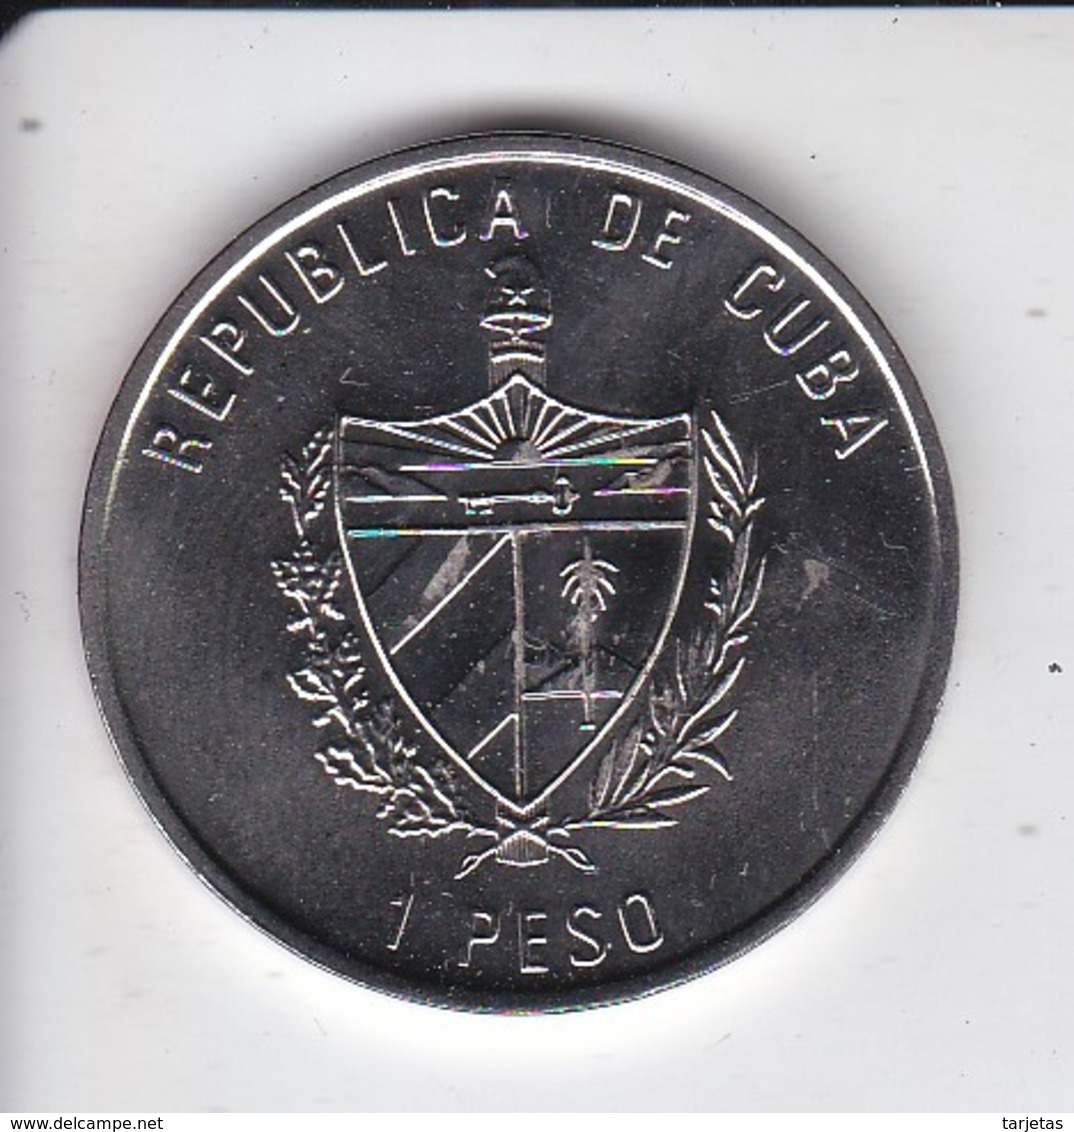 MONEDA DE CUBA DE 1 PESO DEL AÑO 2001 FLORA CUBANA (COIN) ORQUIDEA-ORCHID-FLOR-FLOWER - Cuba